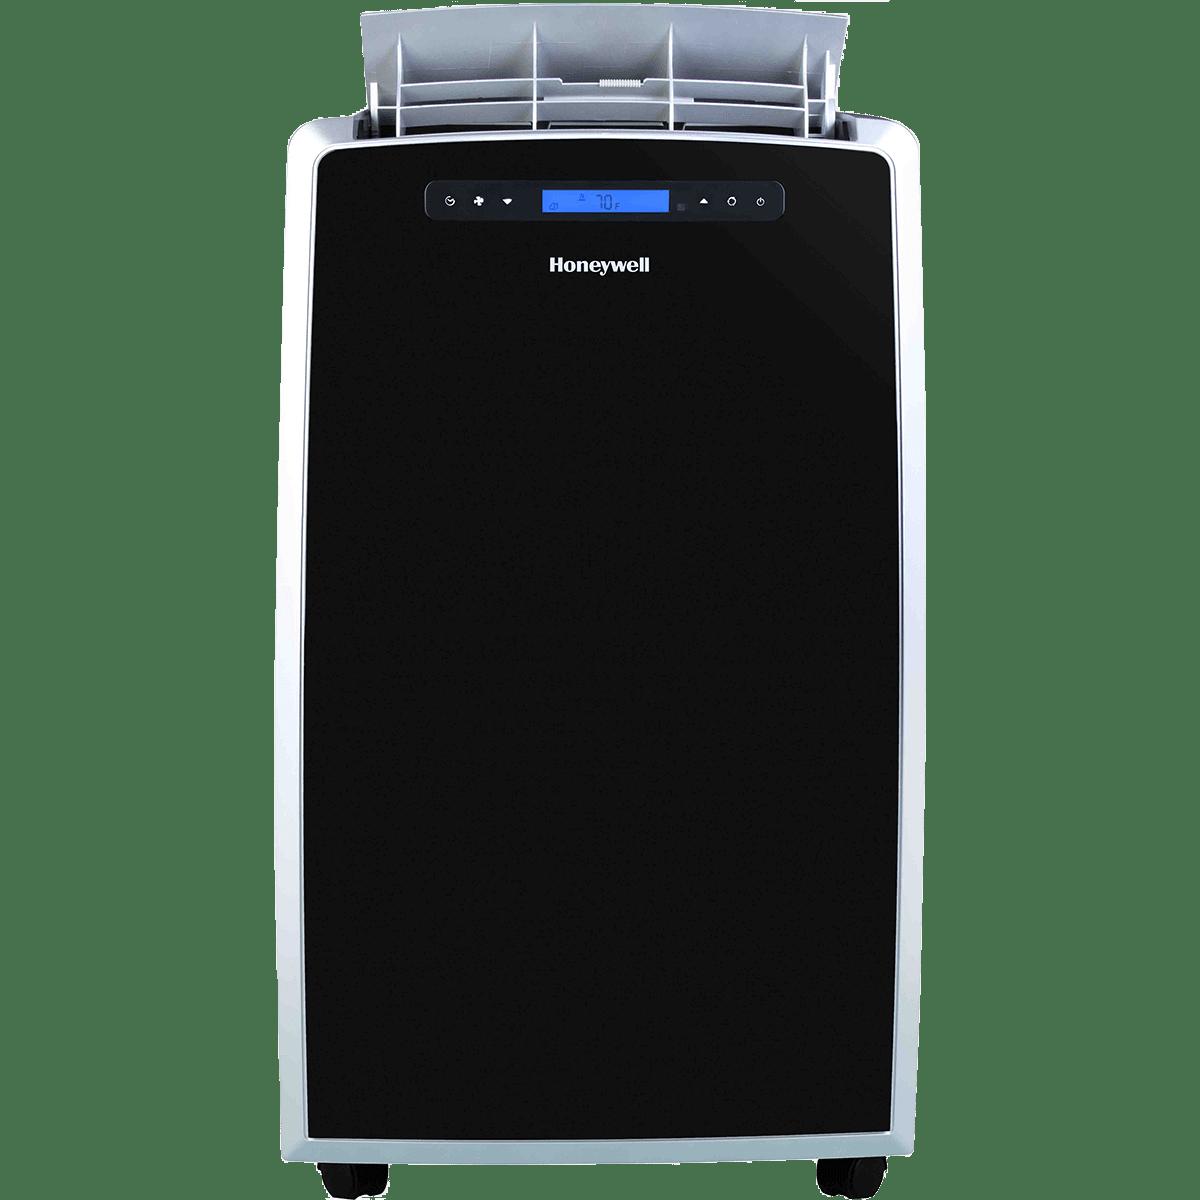 Honeywell 14,000 BTU Portable Air Conditioner - MM14C ho3154